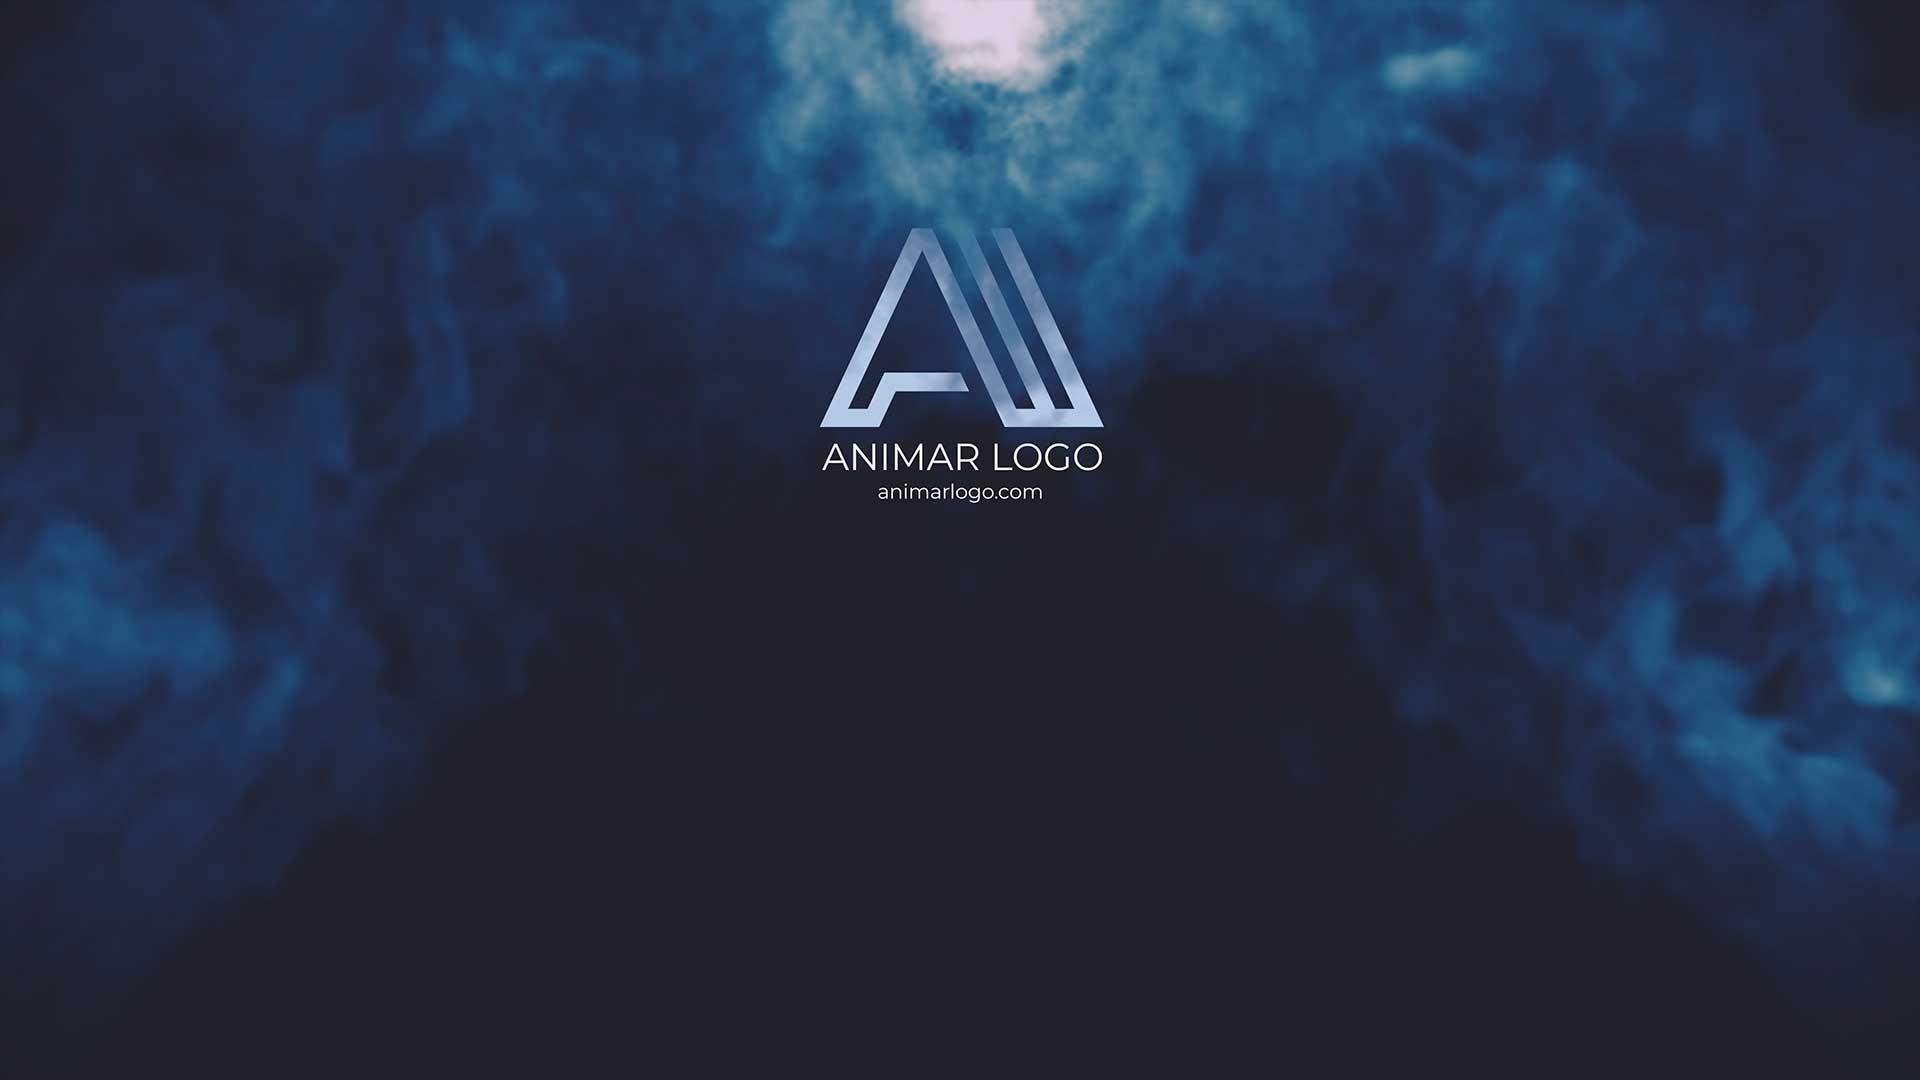 Logo-animado-Humo-Vertical-AL314-animacion-logotipo